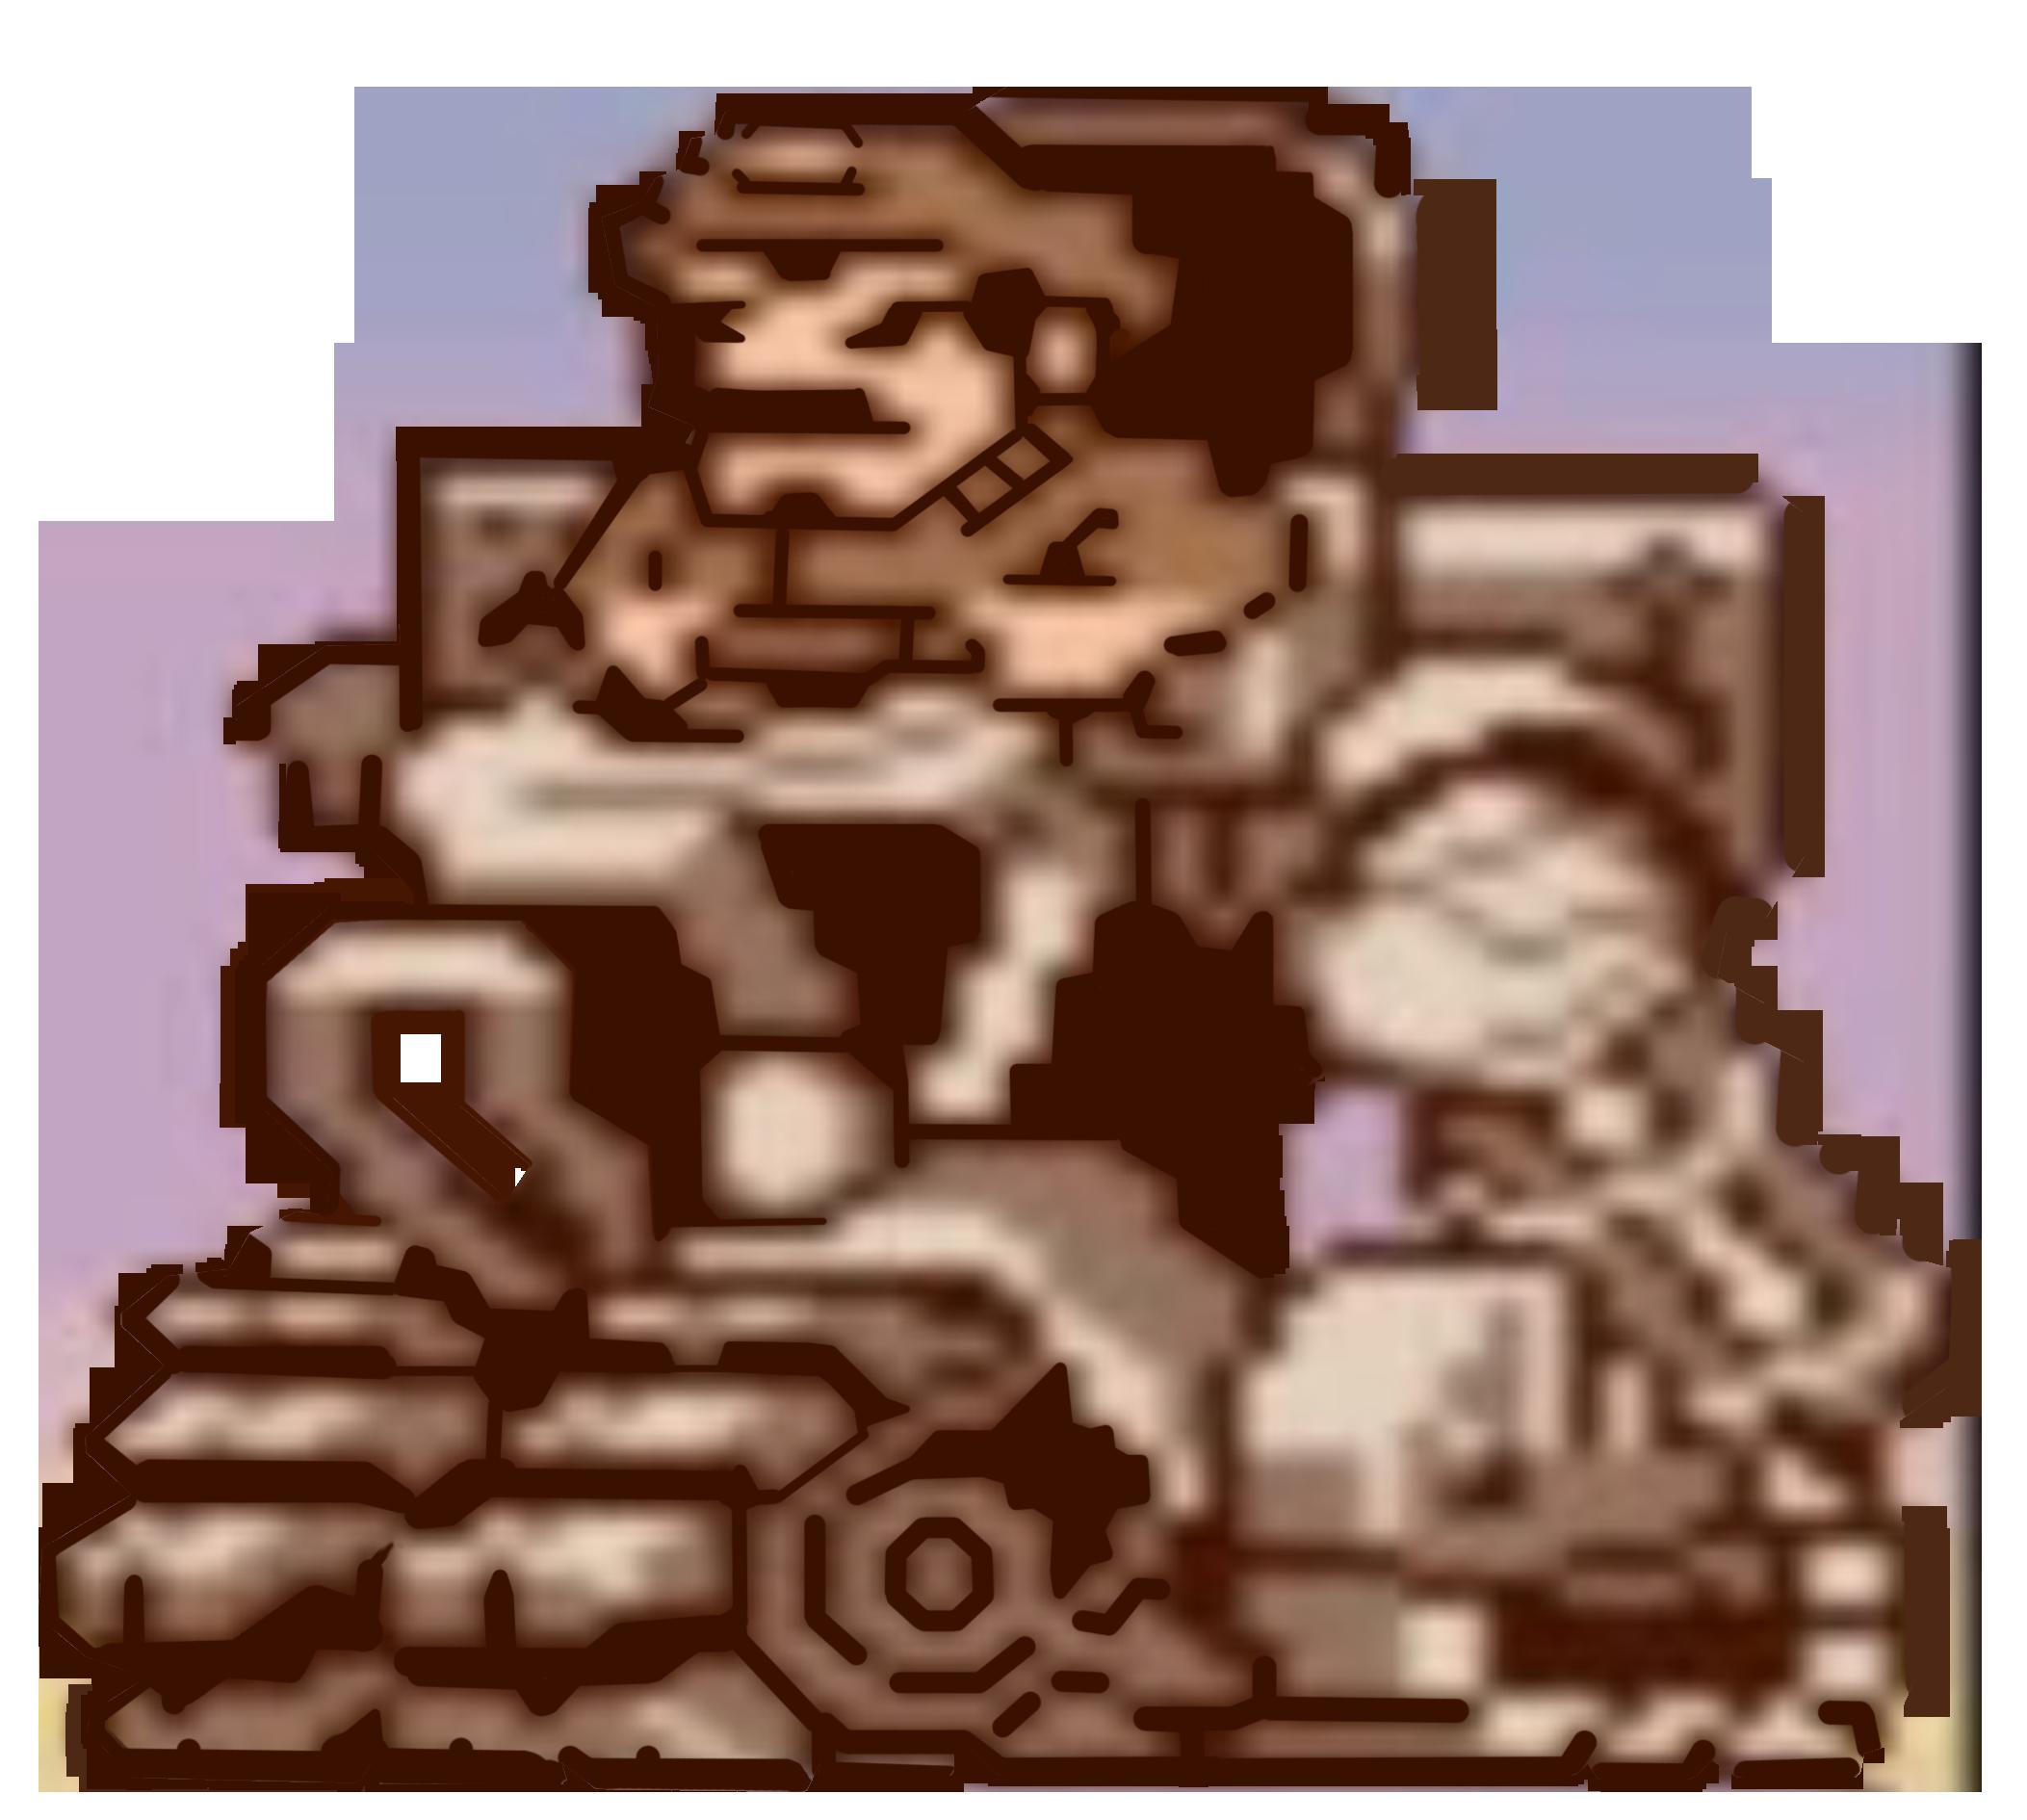 Missions clipart top secret. Characters metal slug wiki